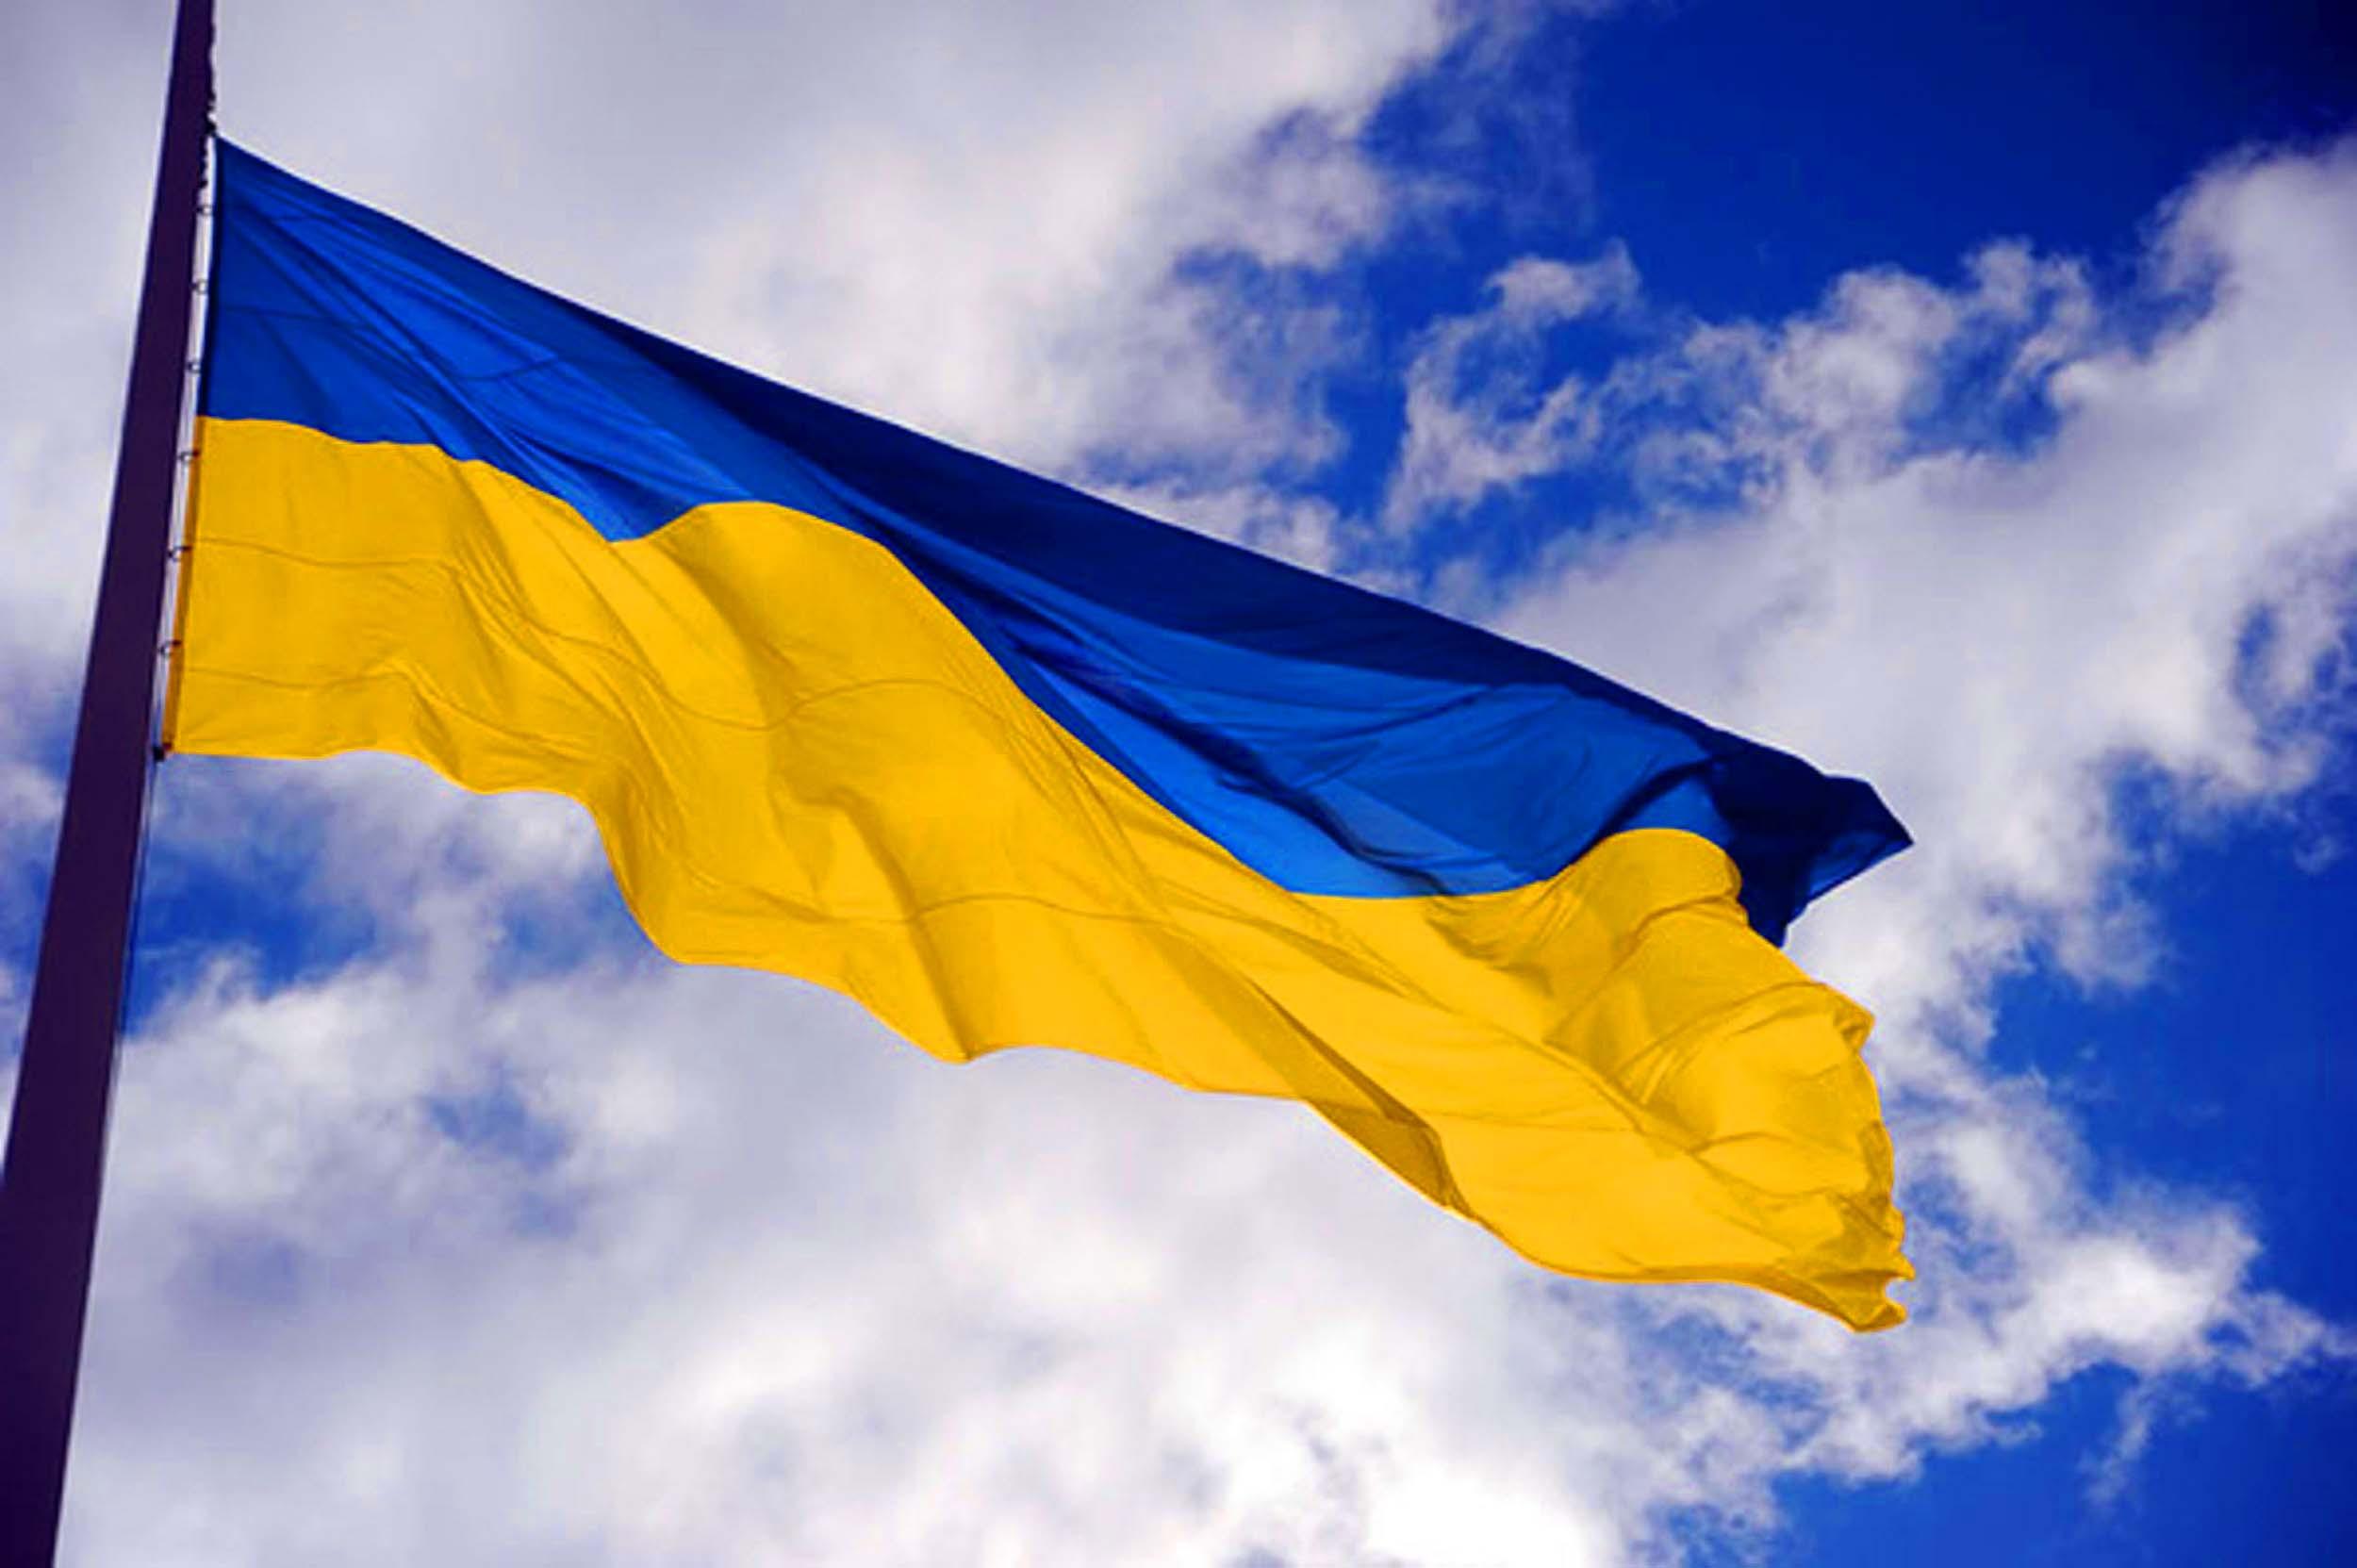 Ucrania está en conversaciones para crear un centro de minado de Bitcoin que usará energía nuclear